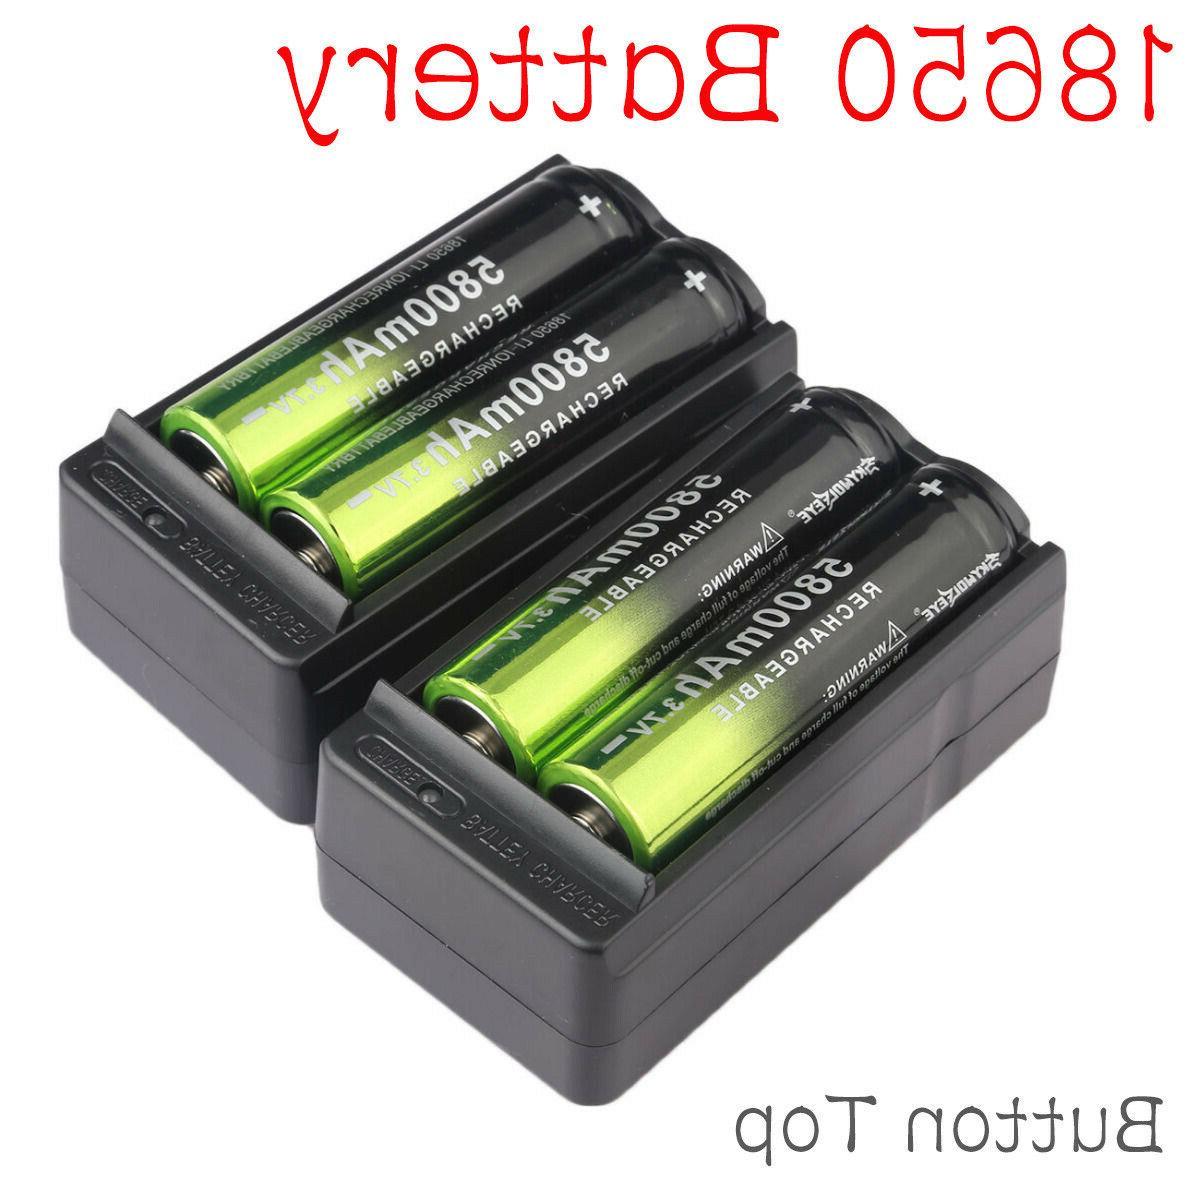 4x 18650 5800mah rechargeable battery li ion